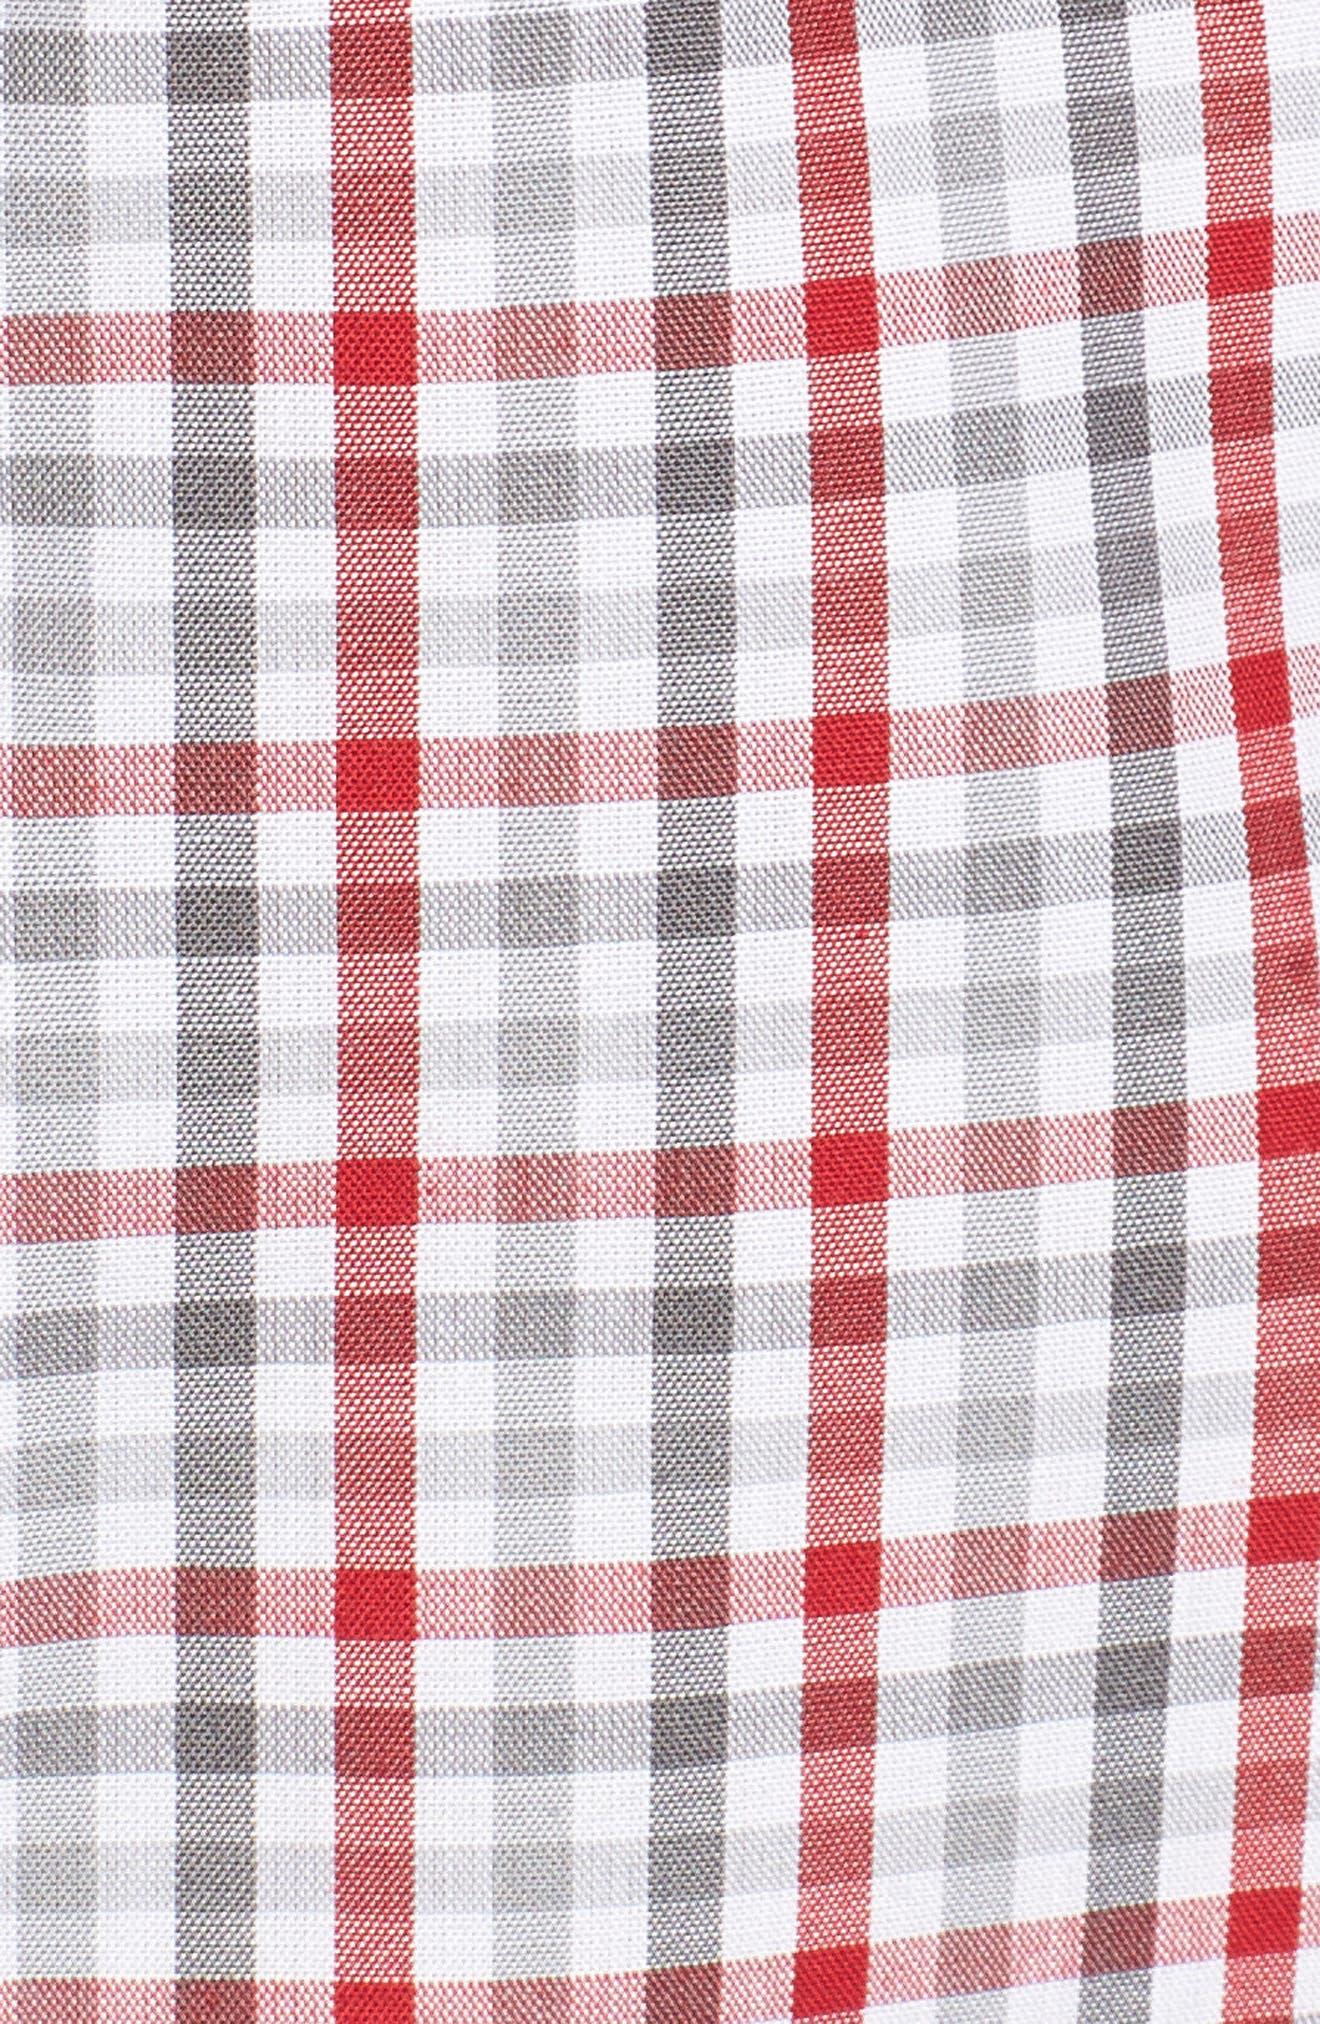 Washington - Gilman Regular Fit Plaid Sport Shirt,                             Alternate thumbnail 5, color,                             CARDINAL RED